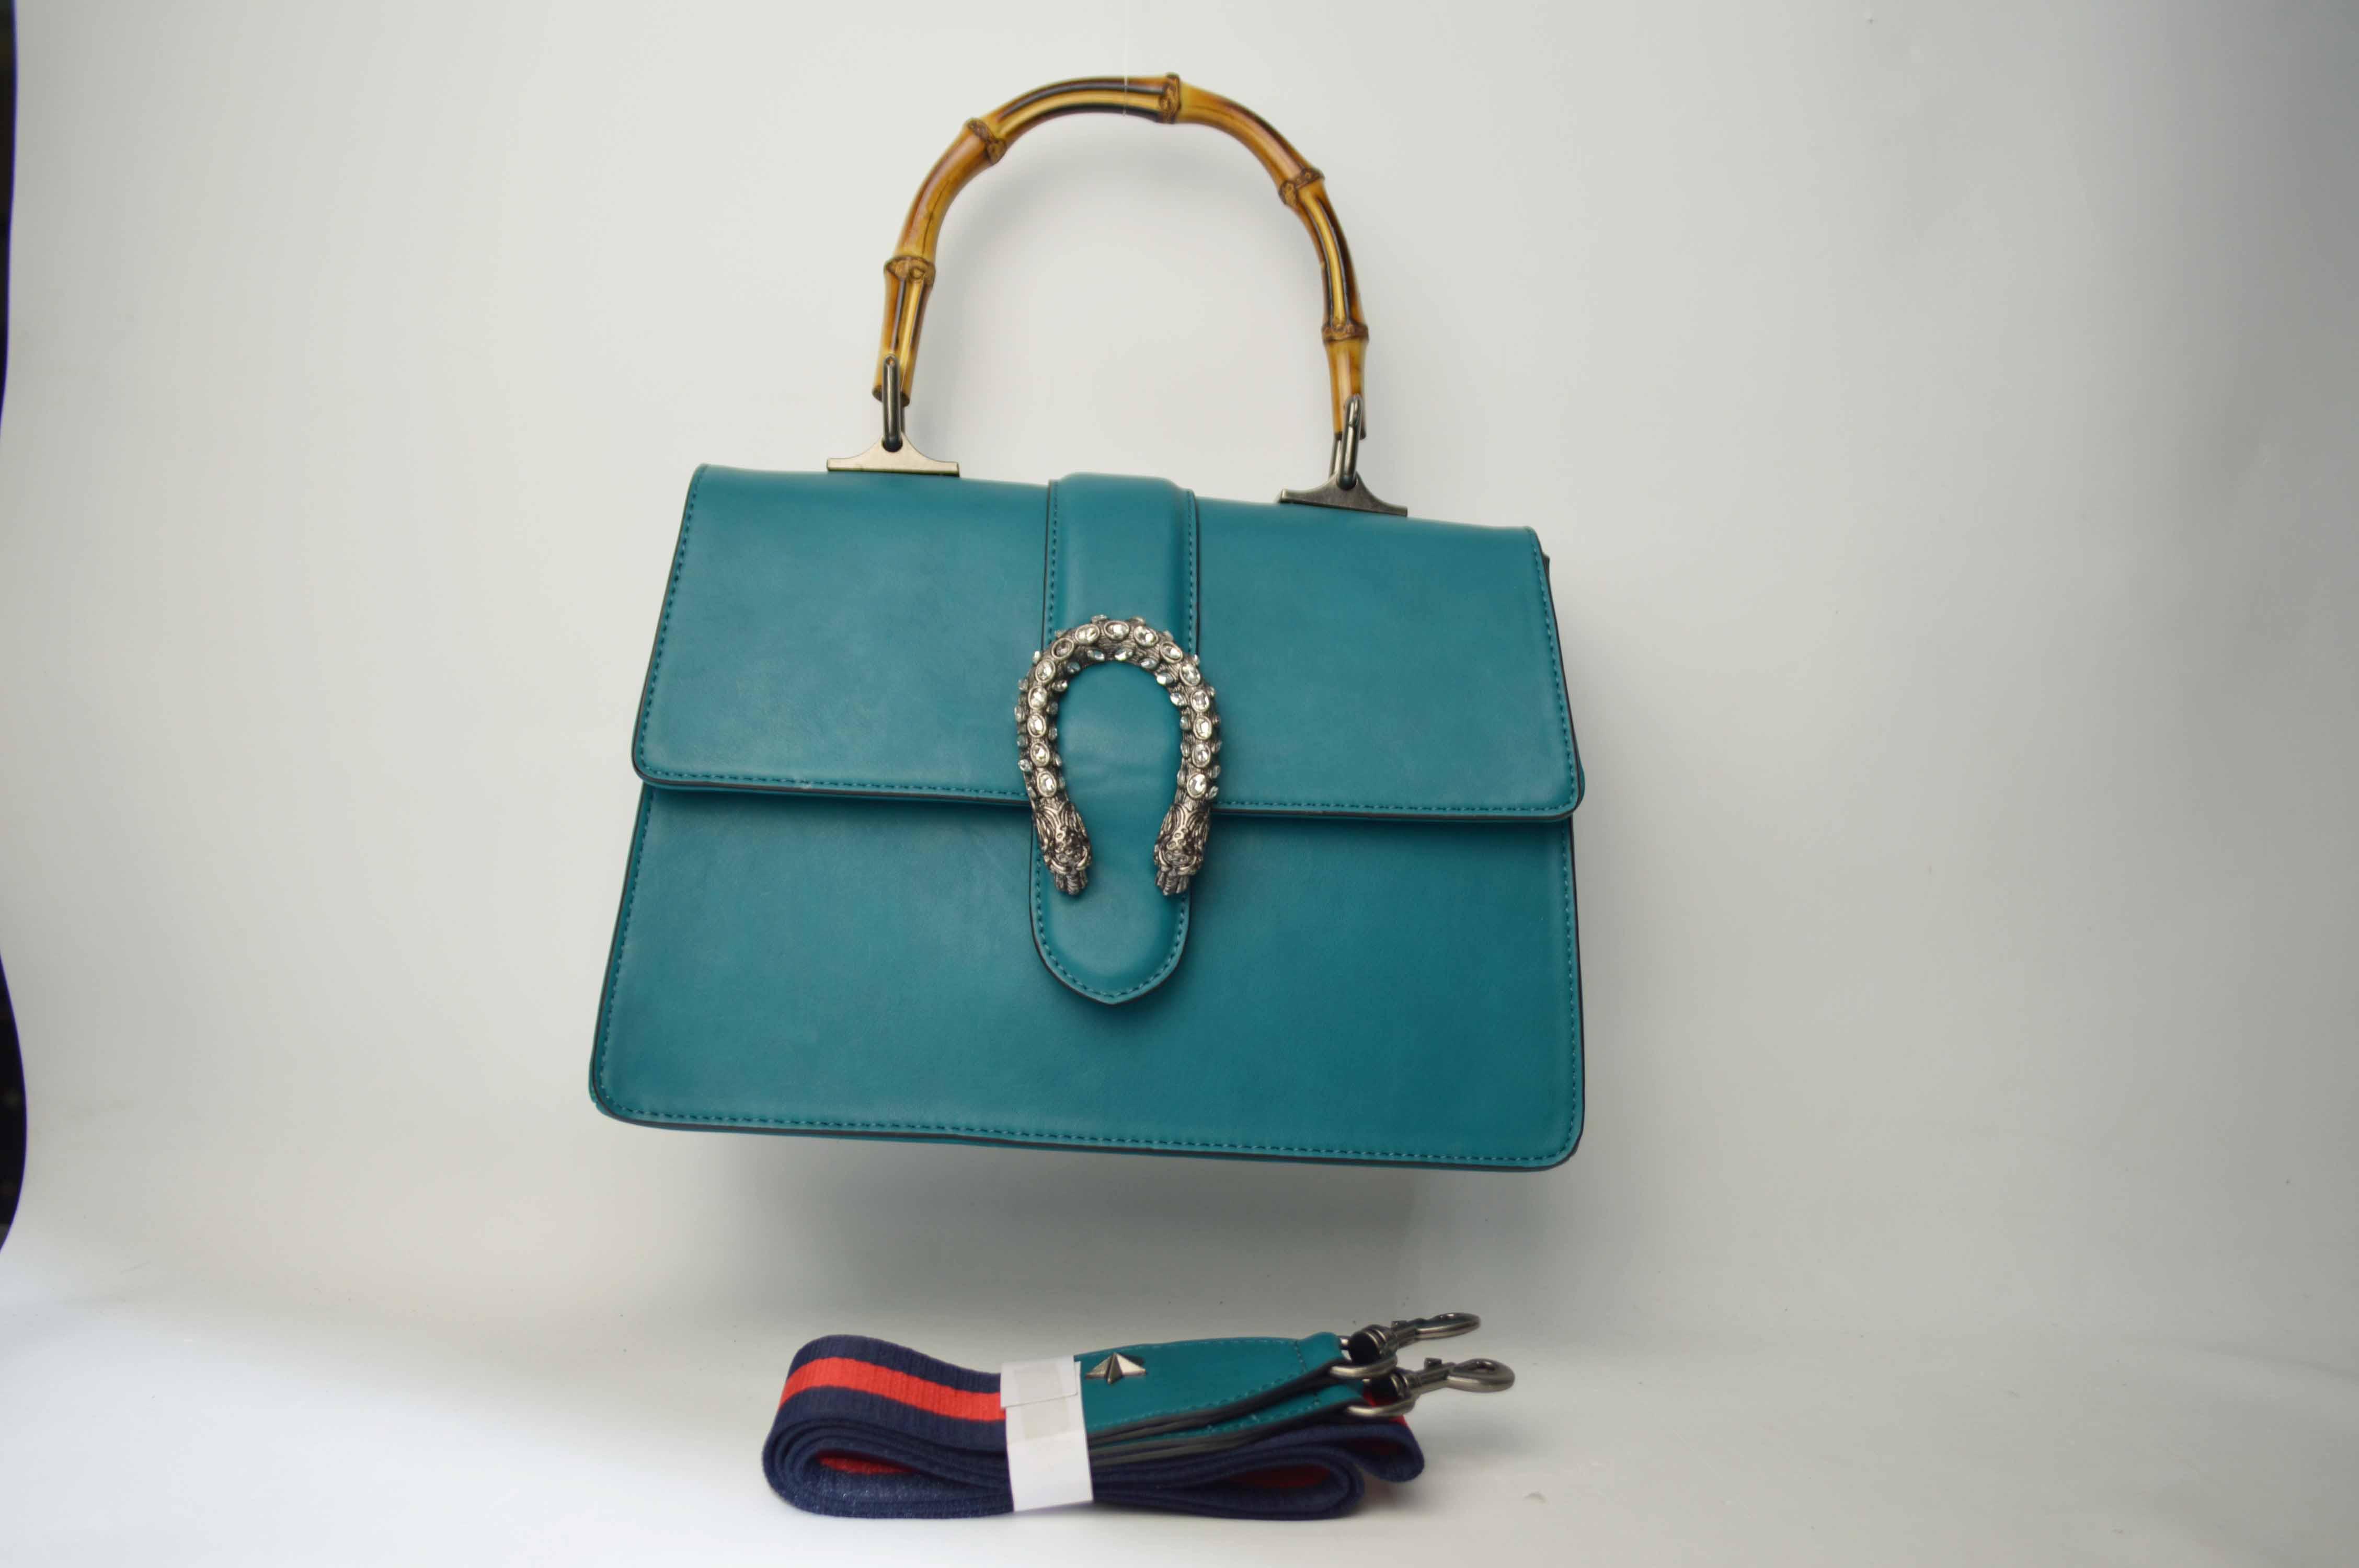 Fashion handbag with bamboo handle BE-4755